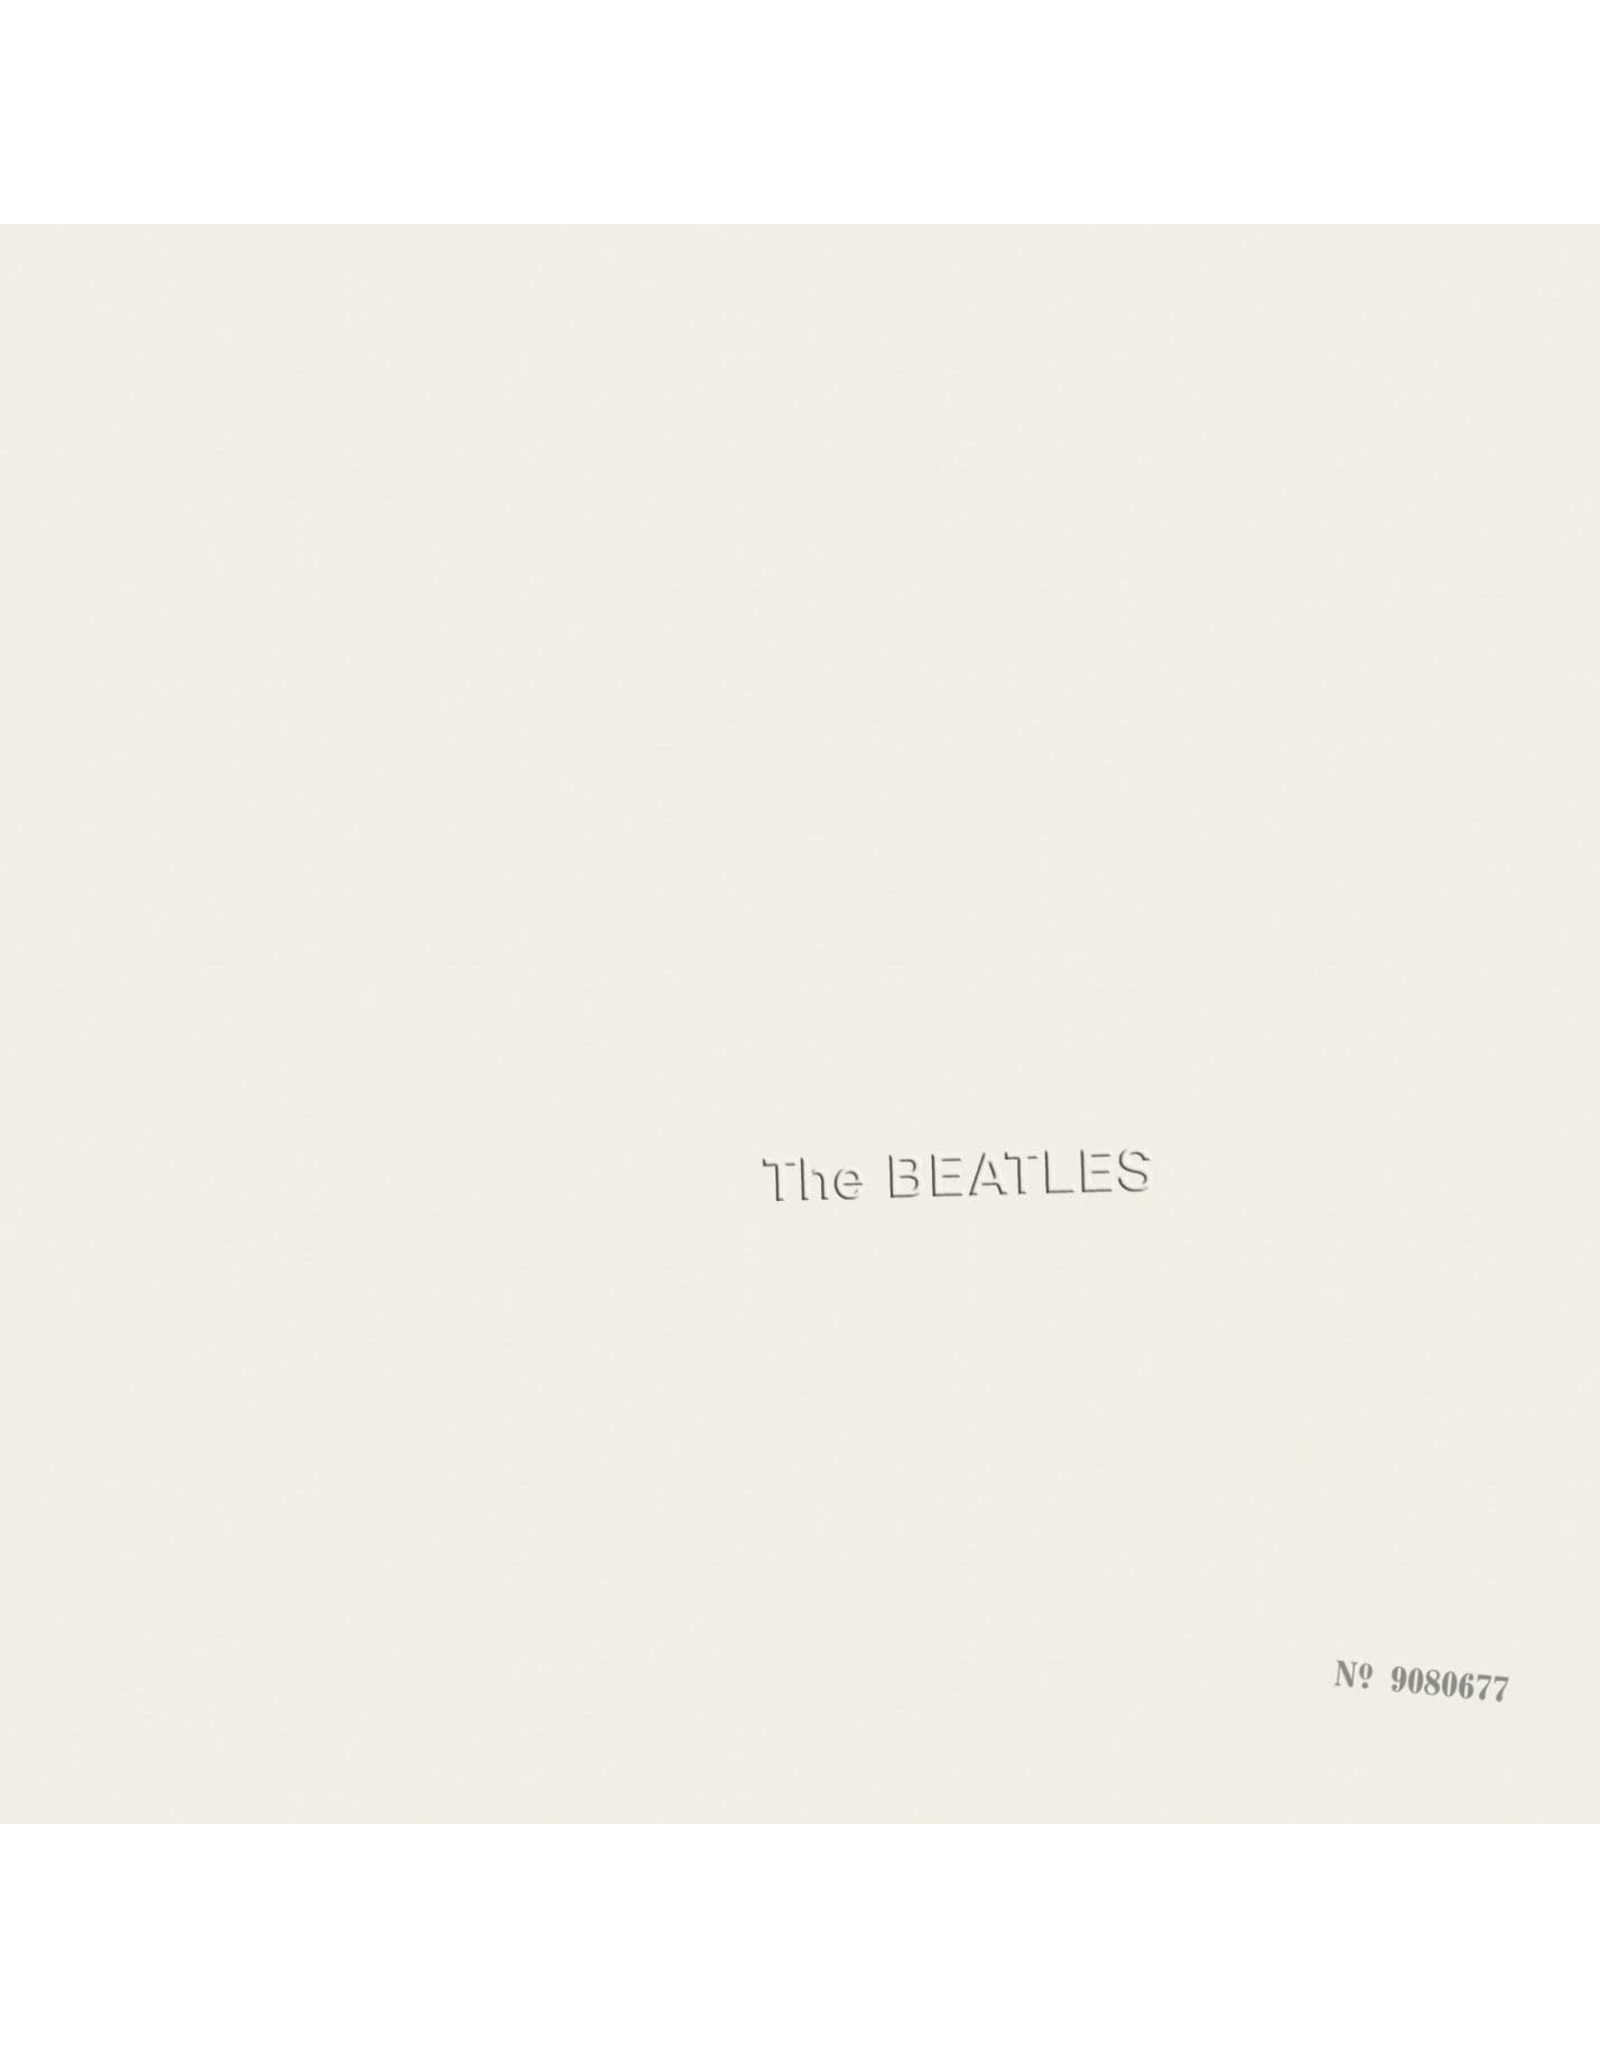 Beatles - White Album (50th Anniversary Deluxe Edition)